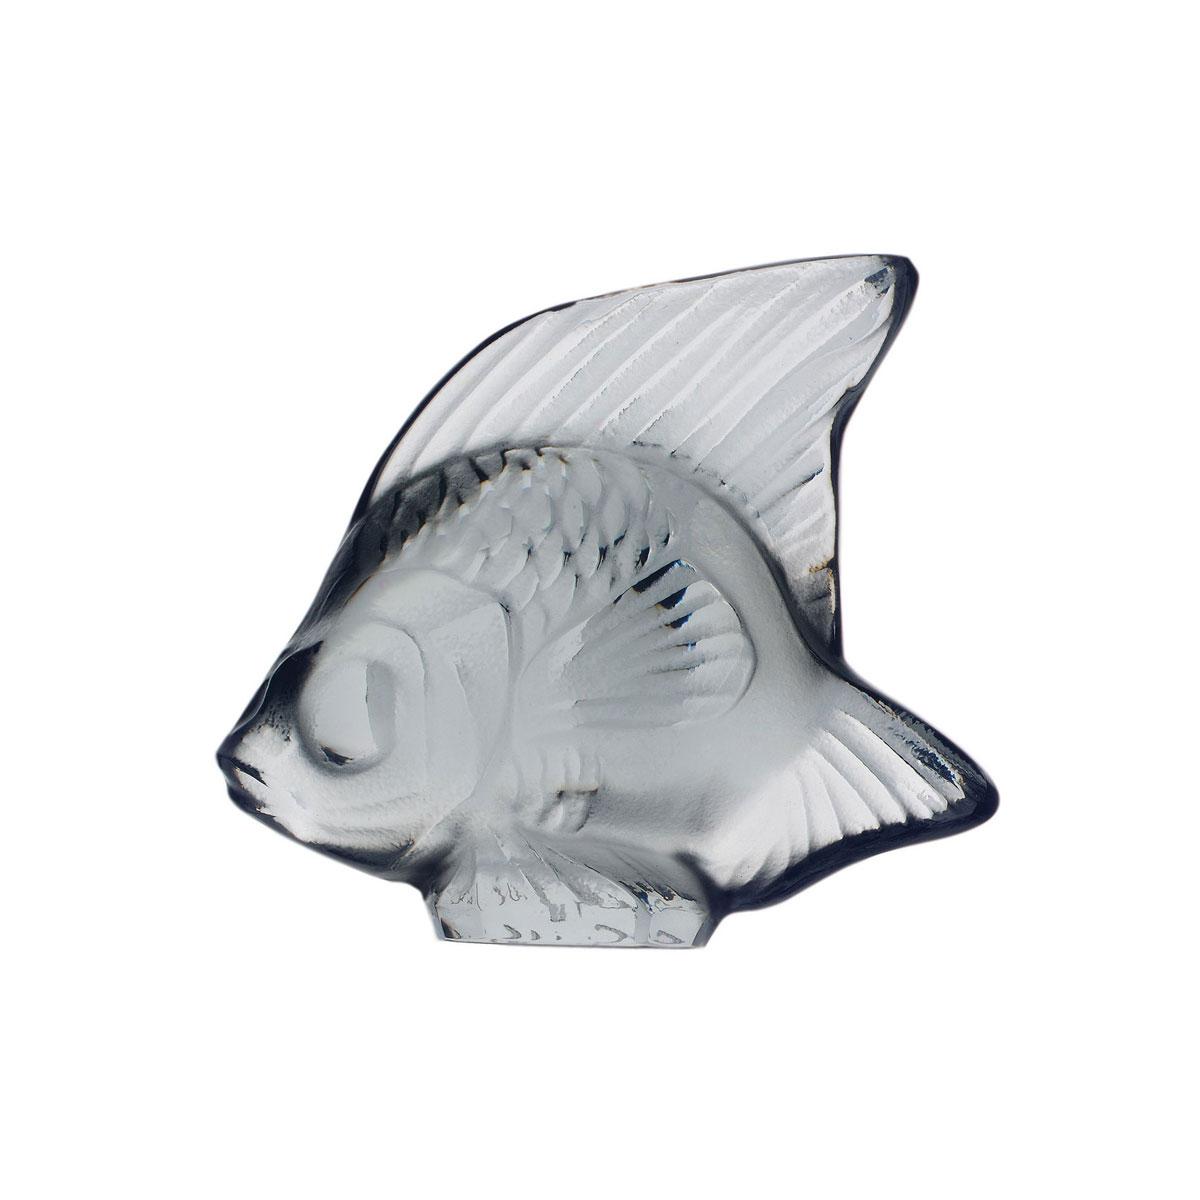 Lalique Crystal, Grey Fish Sculpture